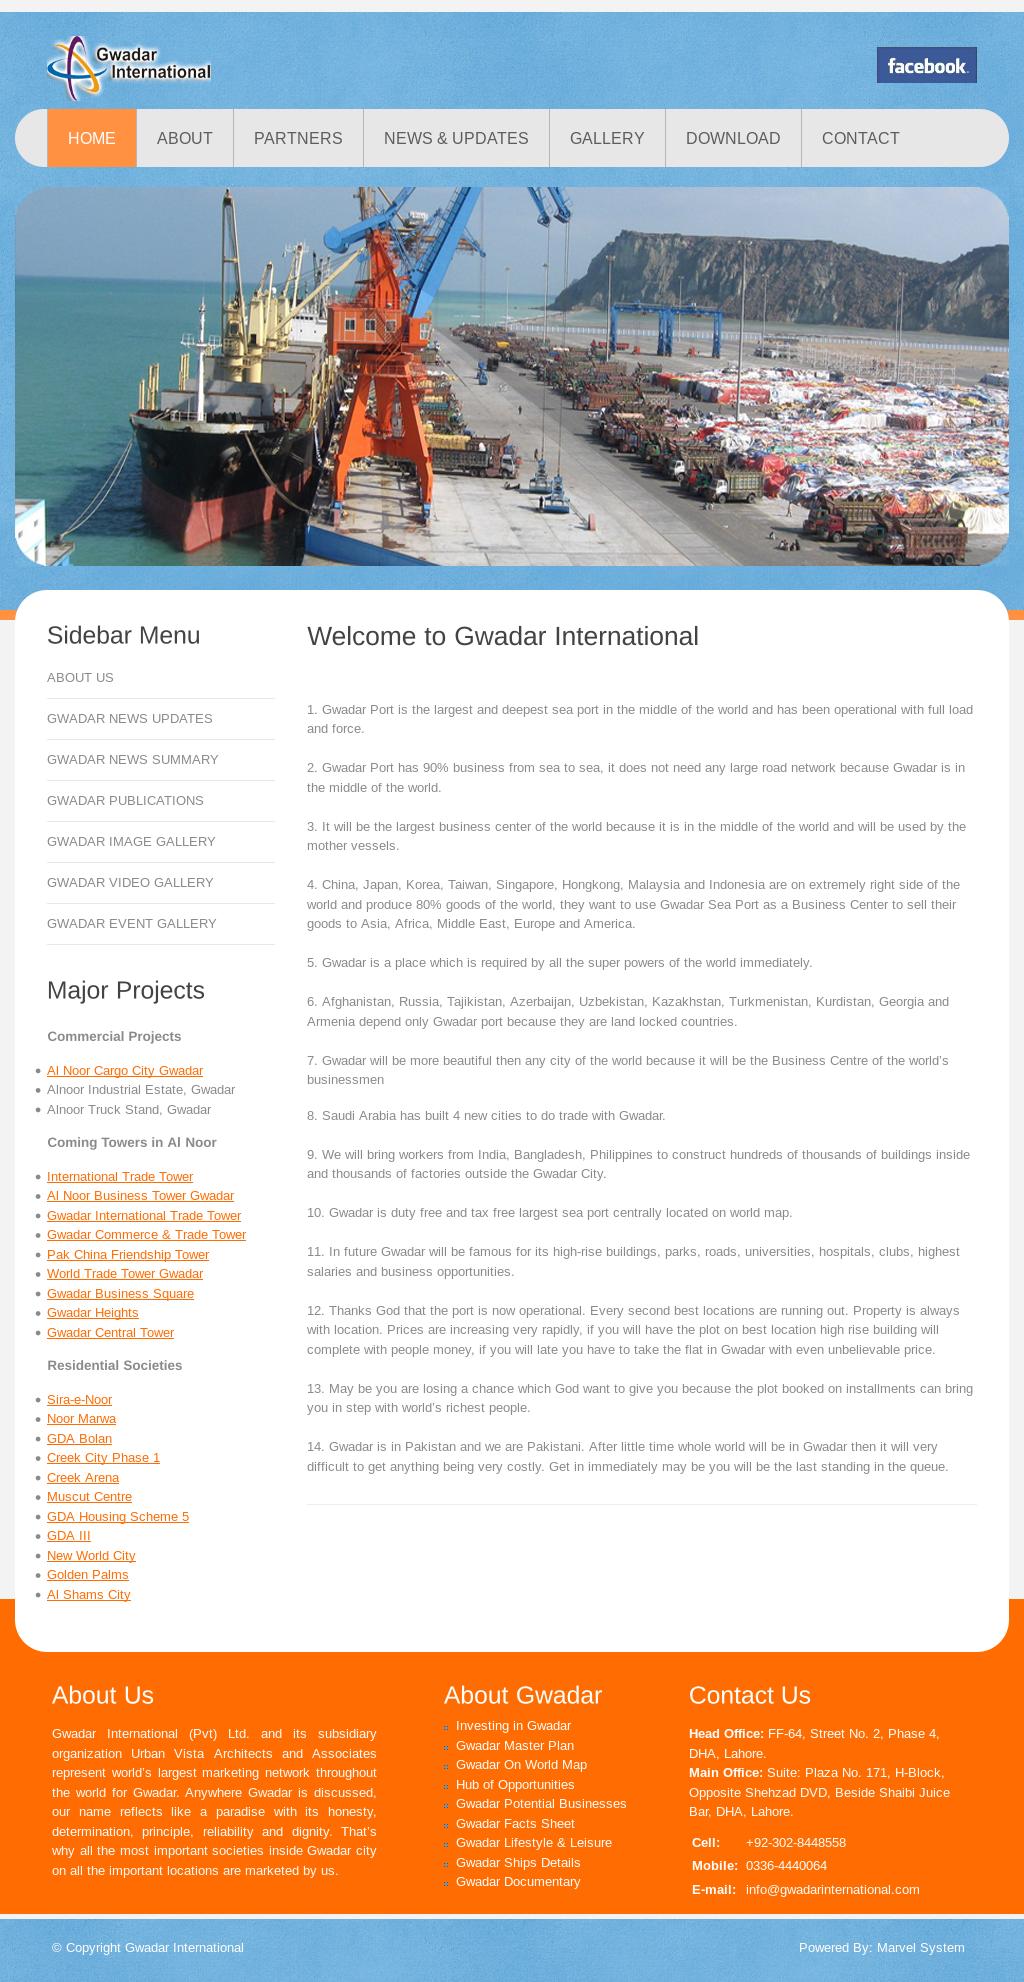 Gwadar International Competitors, Revenue and Employees